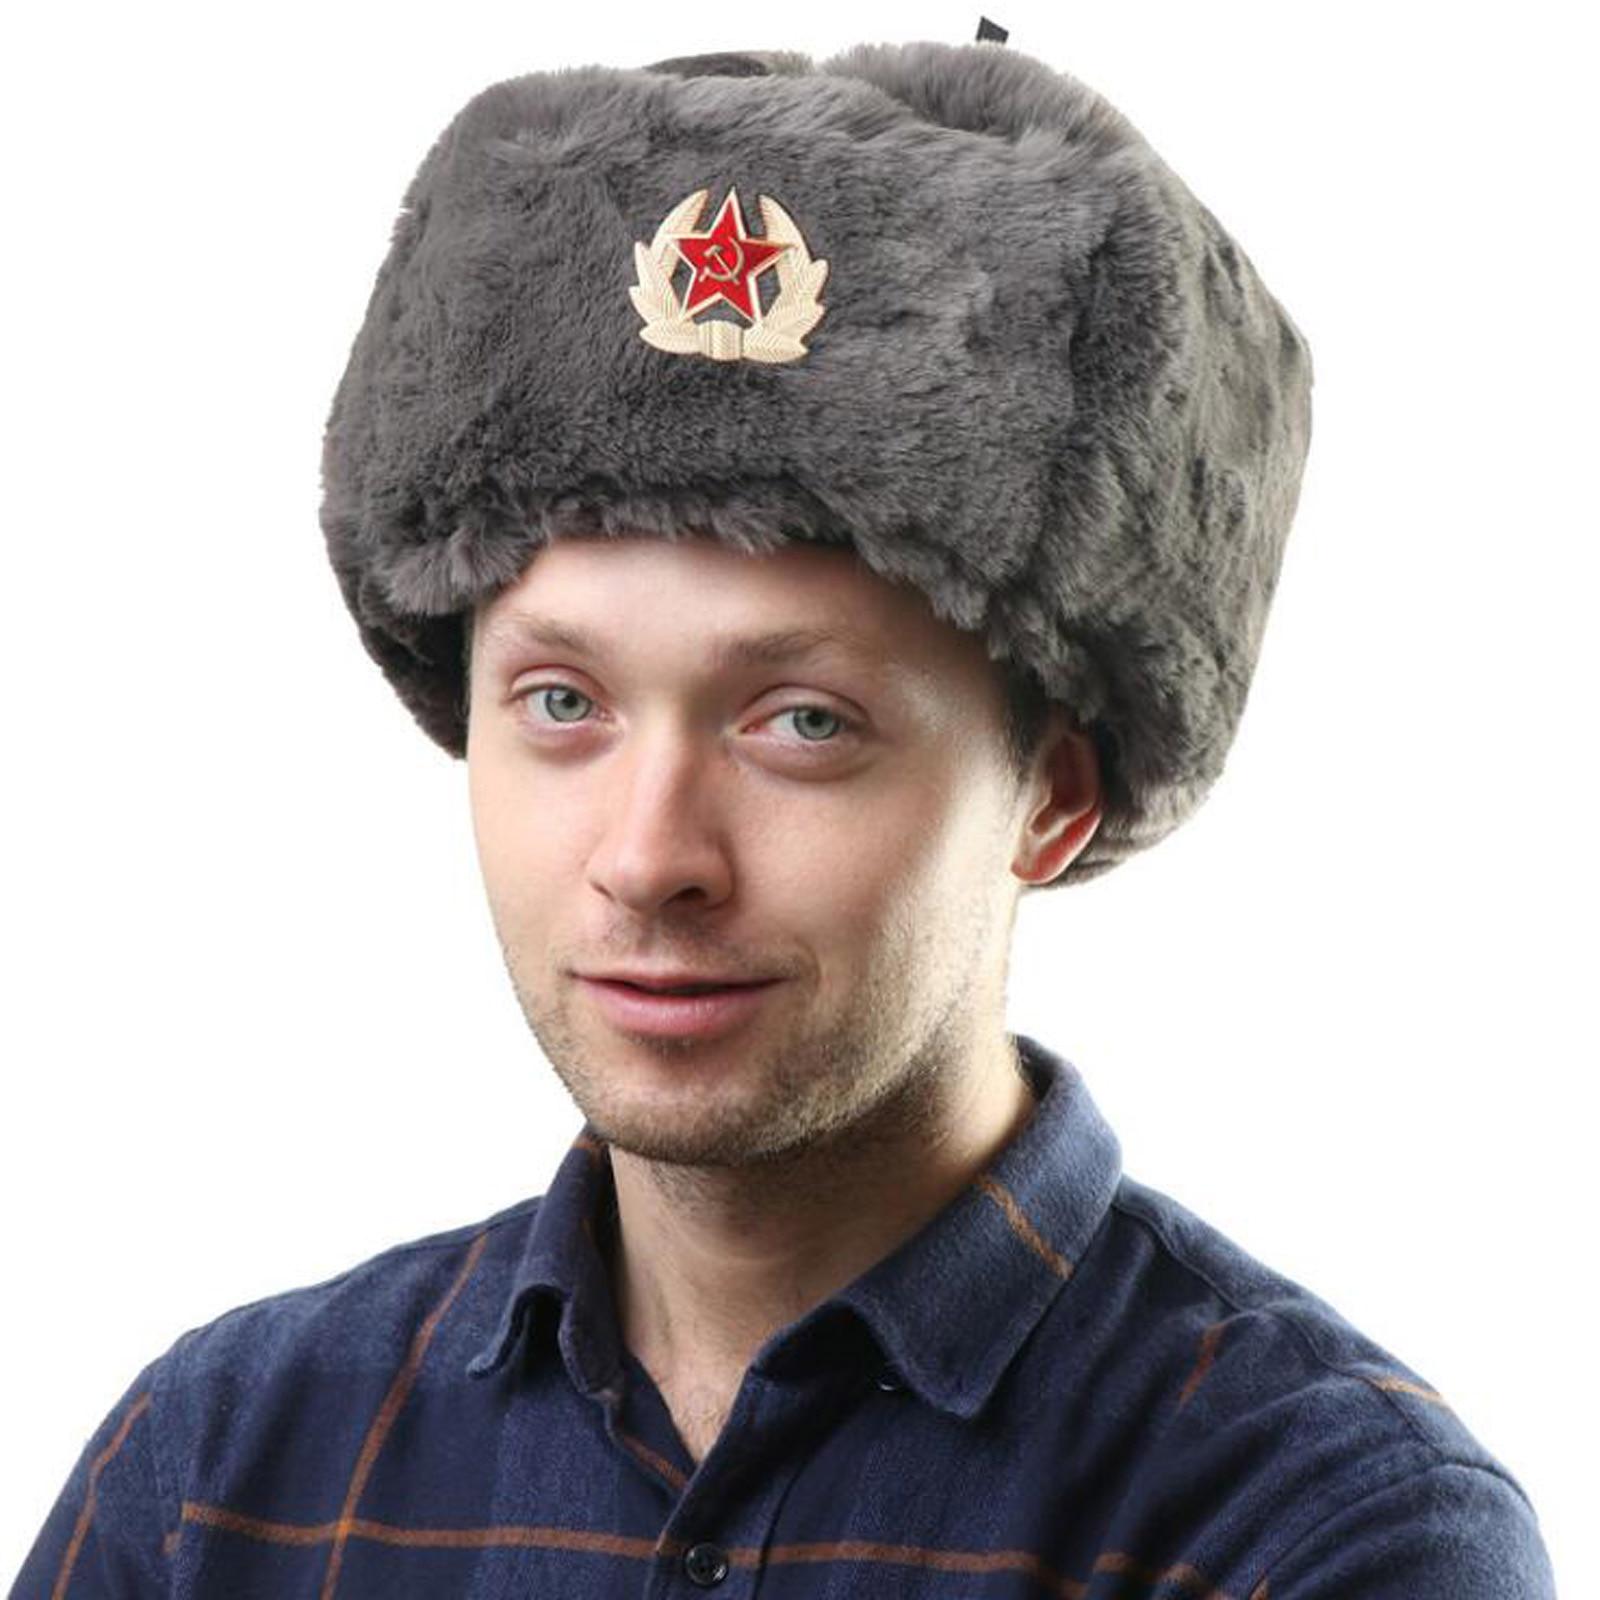 Unisex Fur Soviet Army Military Hat Badge Russia Hats Pilot Trapper Cap Winter Faux Rabbit Earflap Snow 55-60cm Waterproof Cap